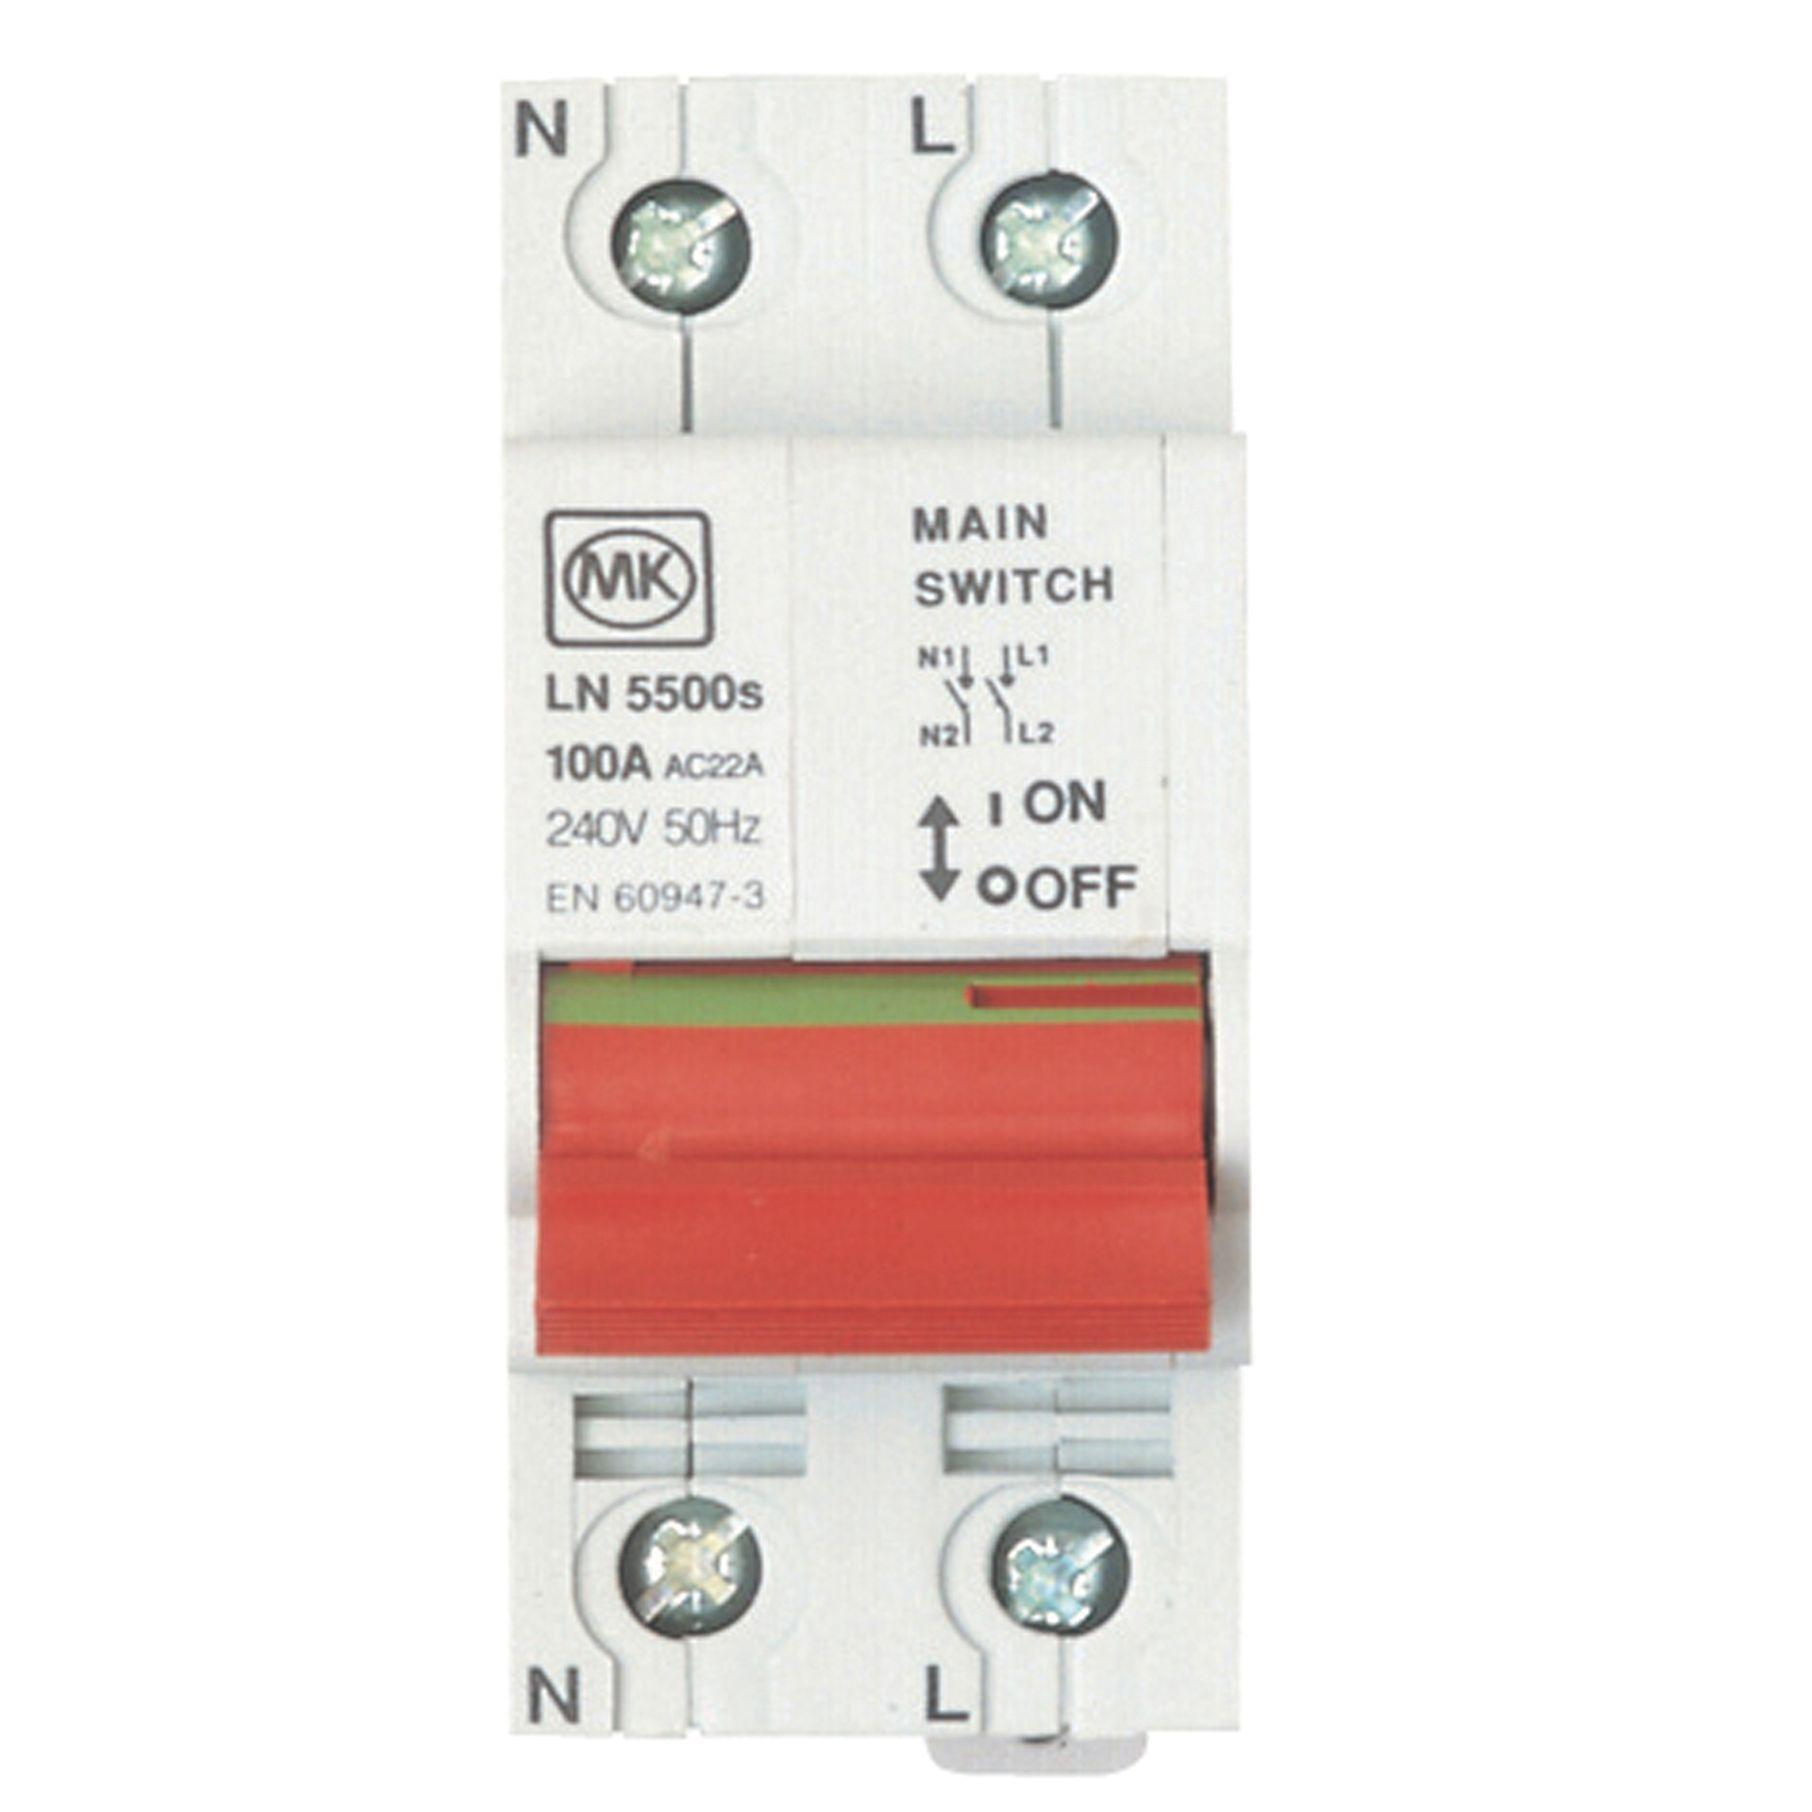 Mk Isolator Switch Wiring Diagram